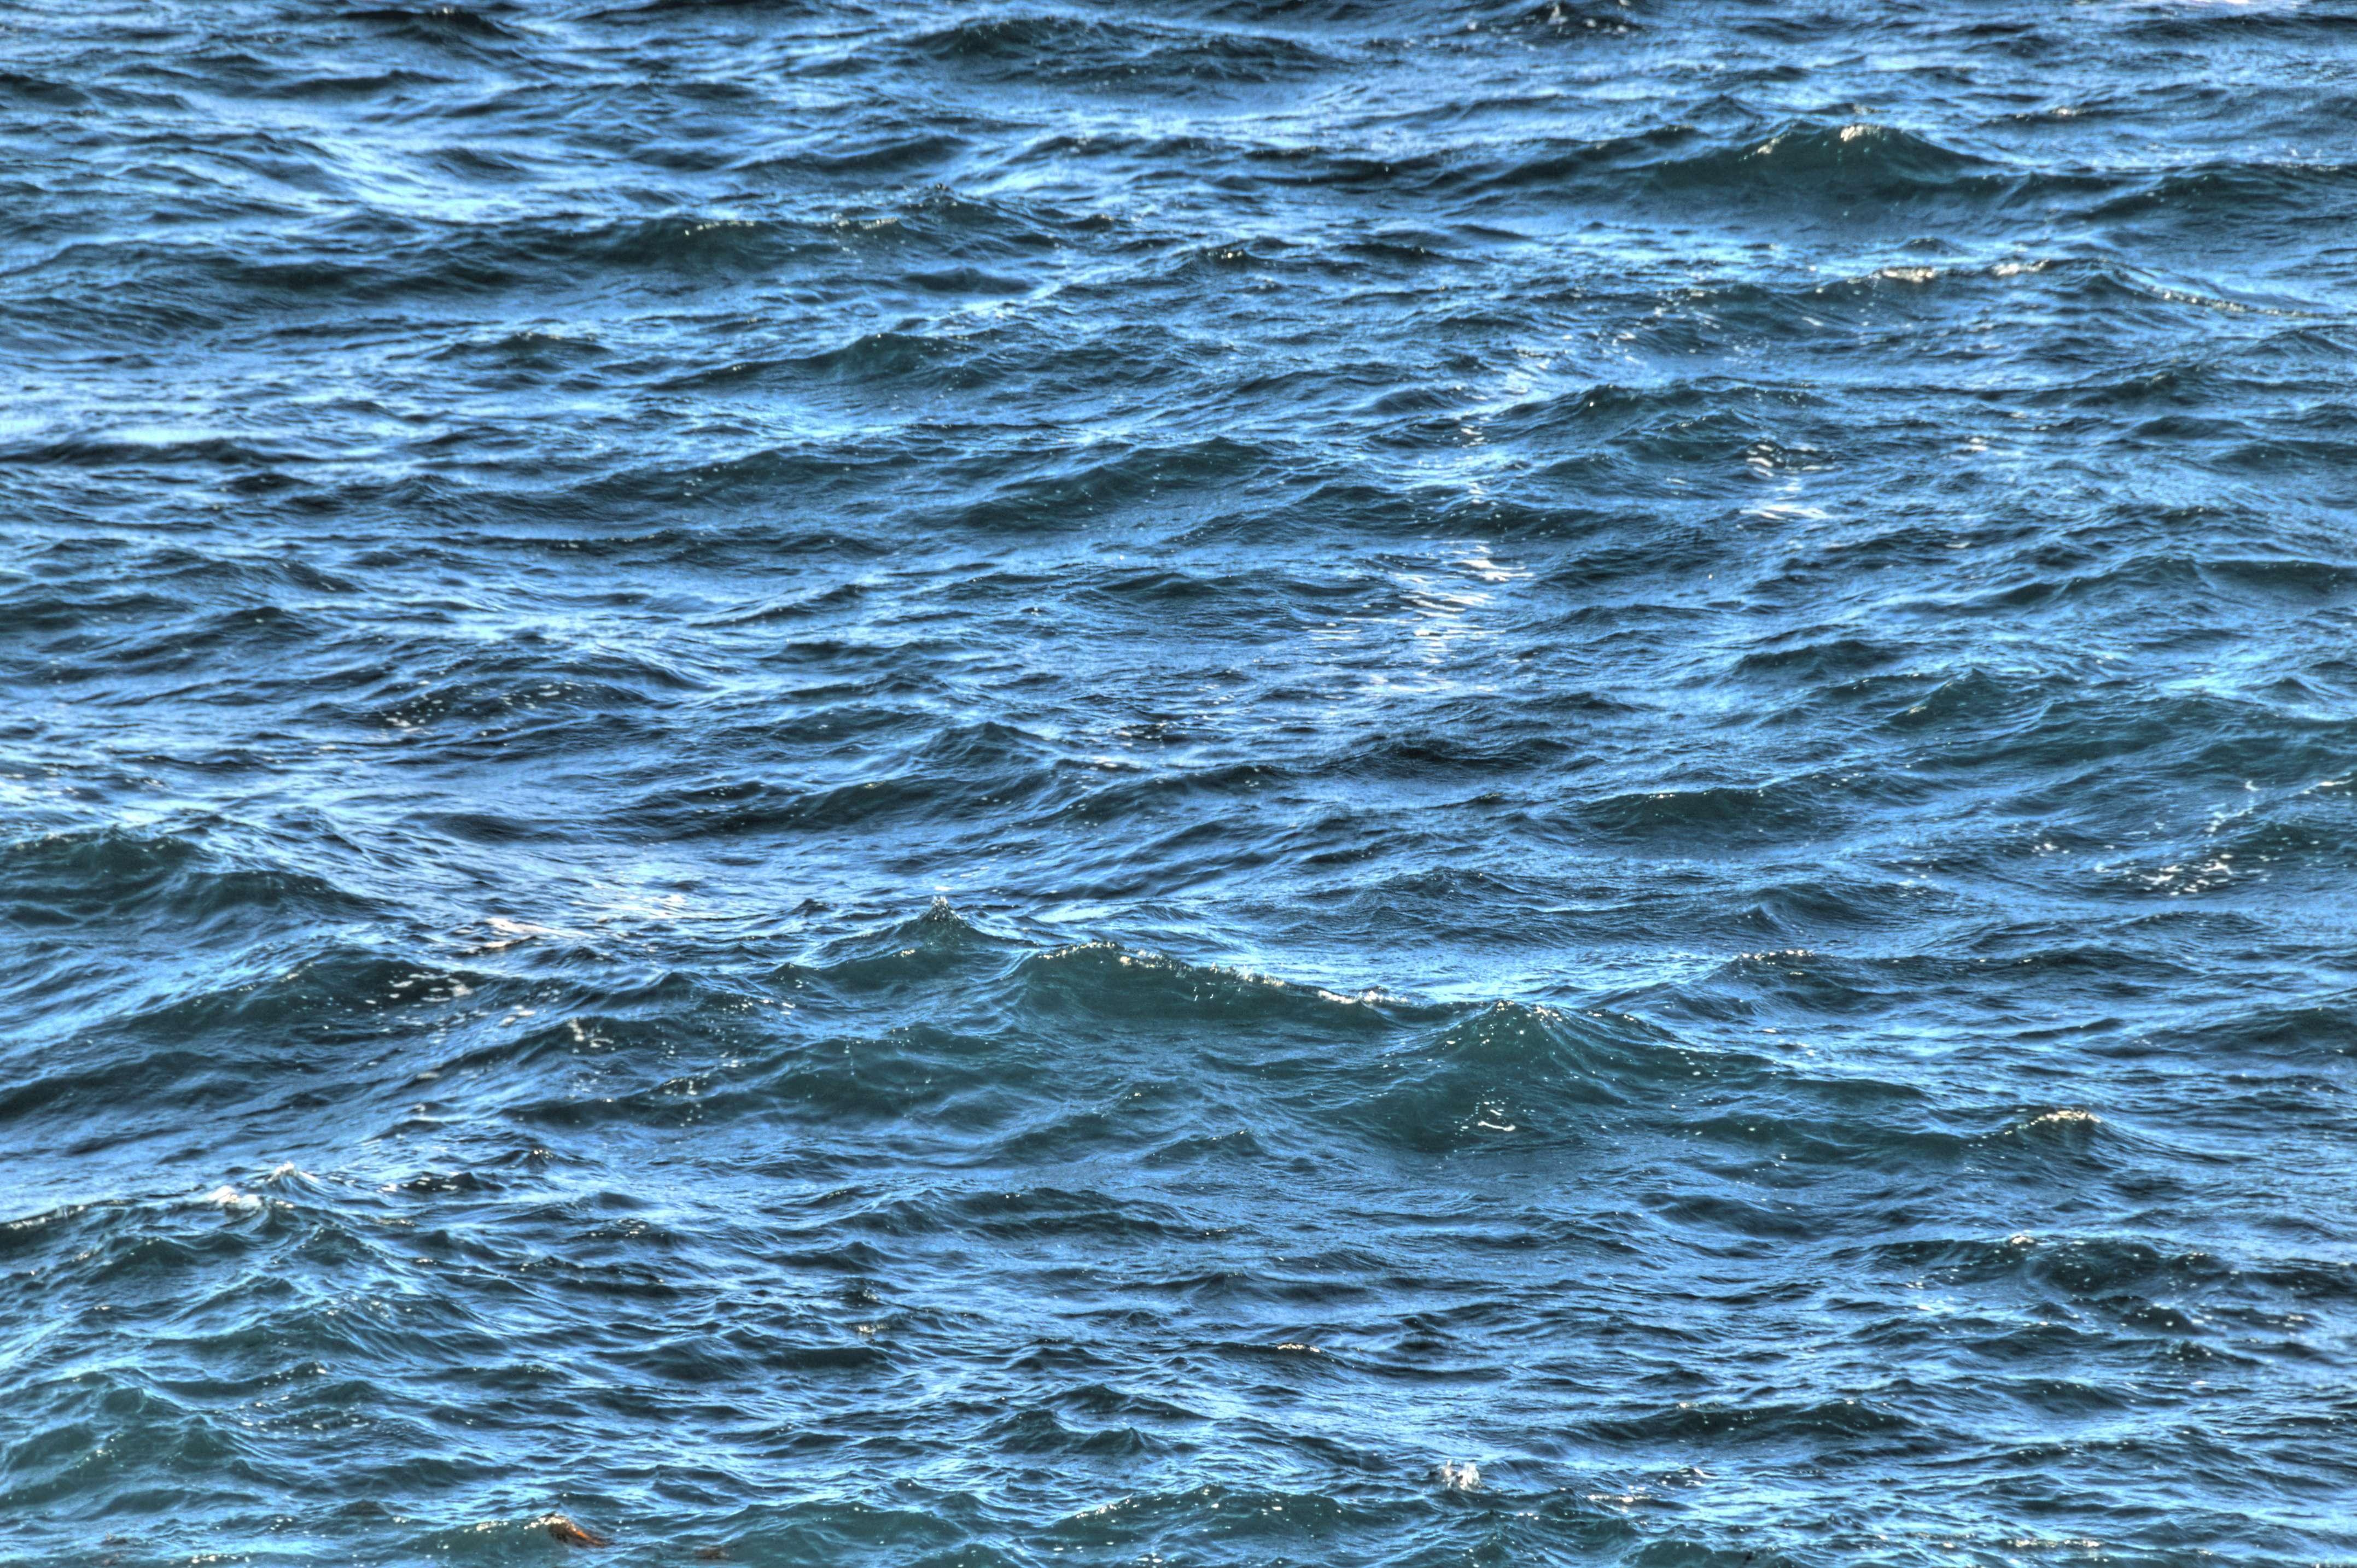 Ocean 2 by ~eddieretelj on deviantART